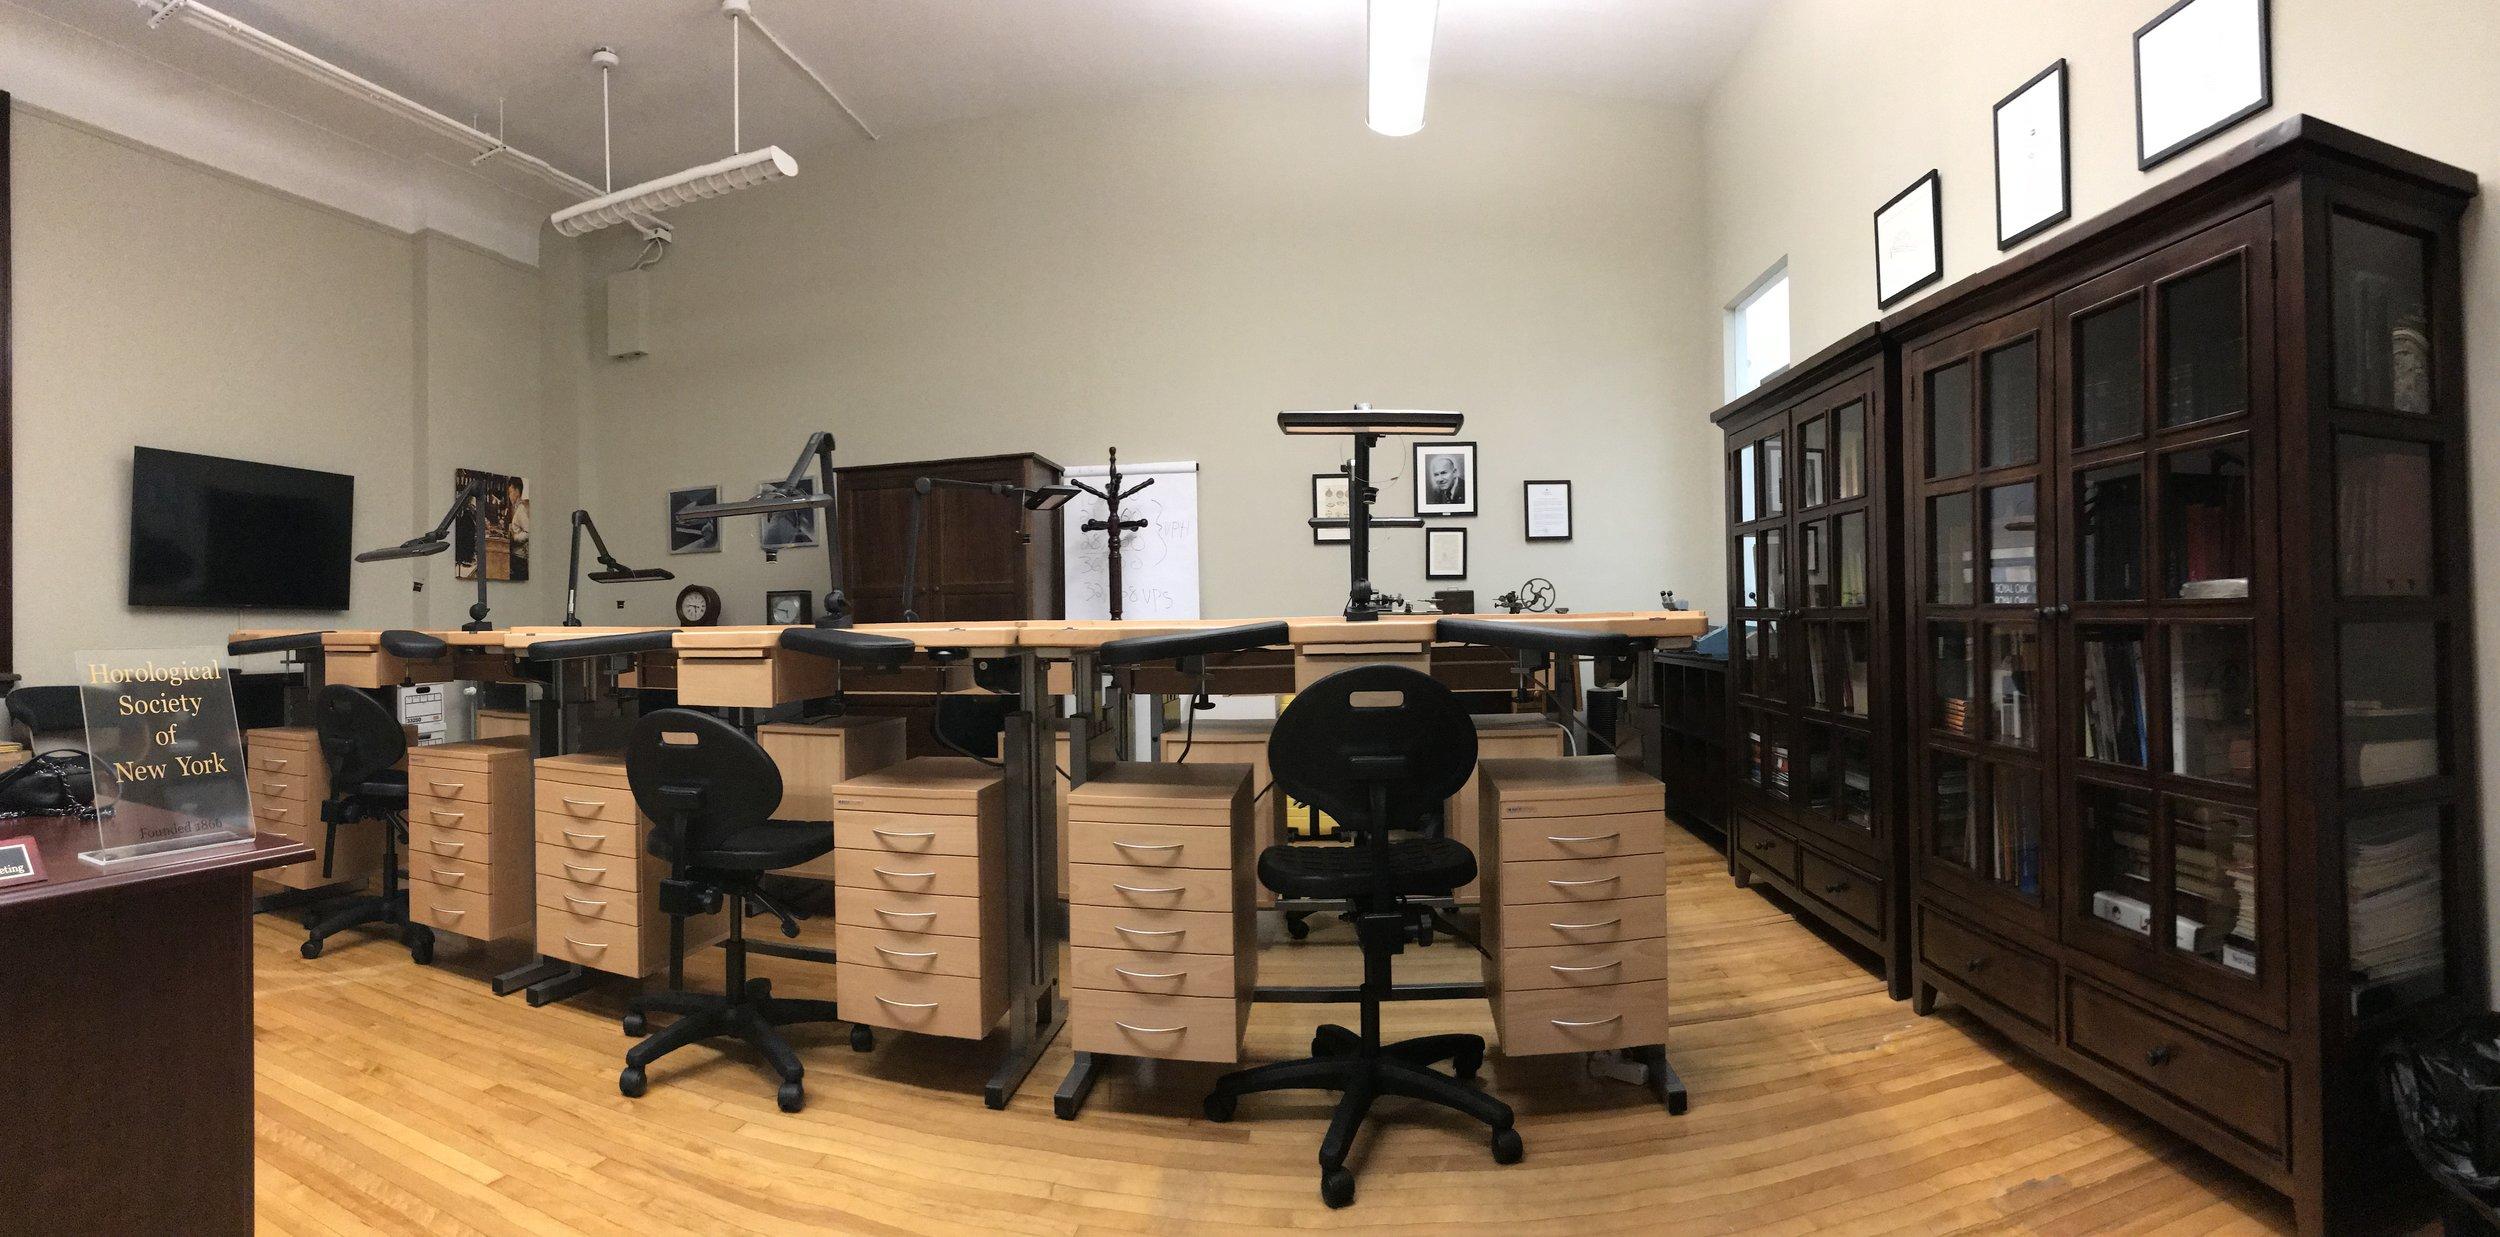 HSNY Classroom.jpg